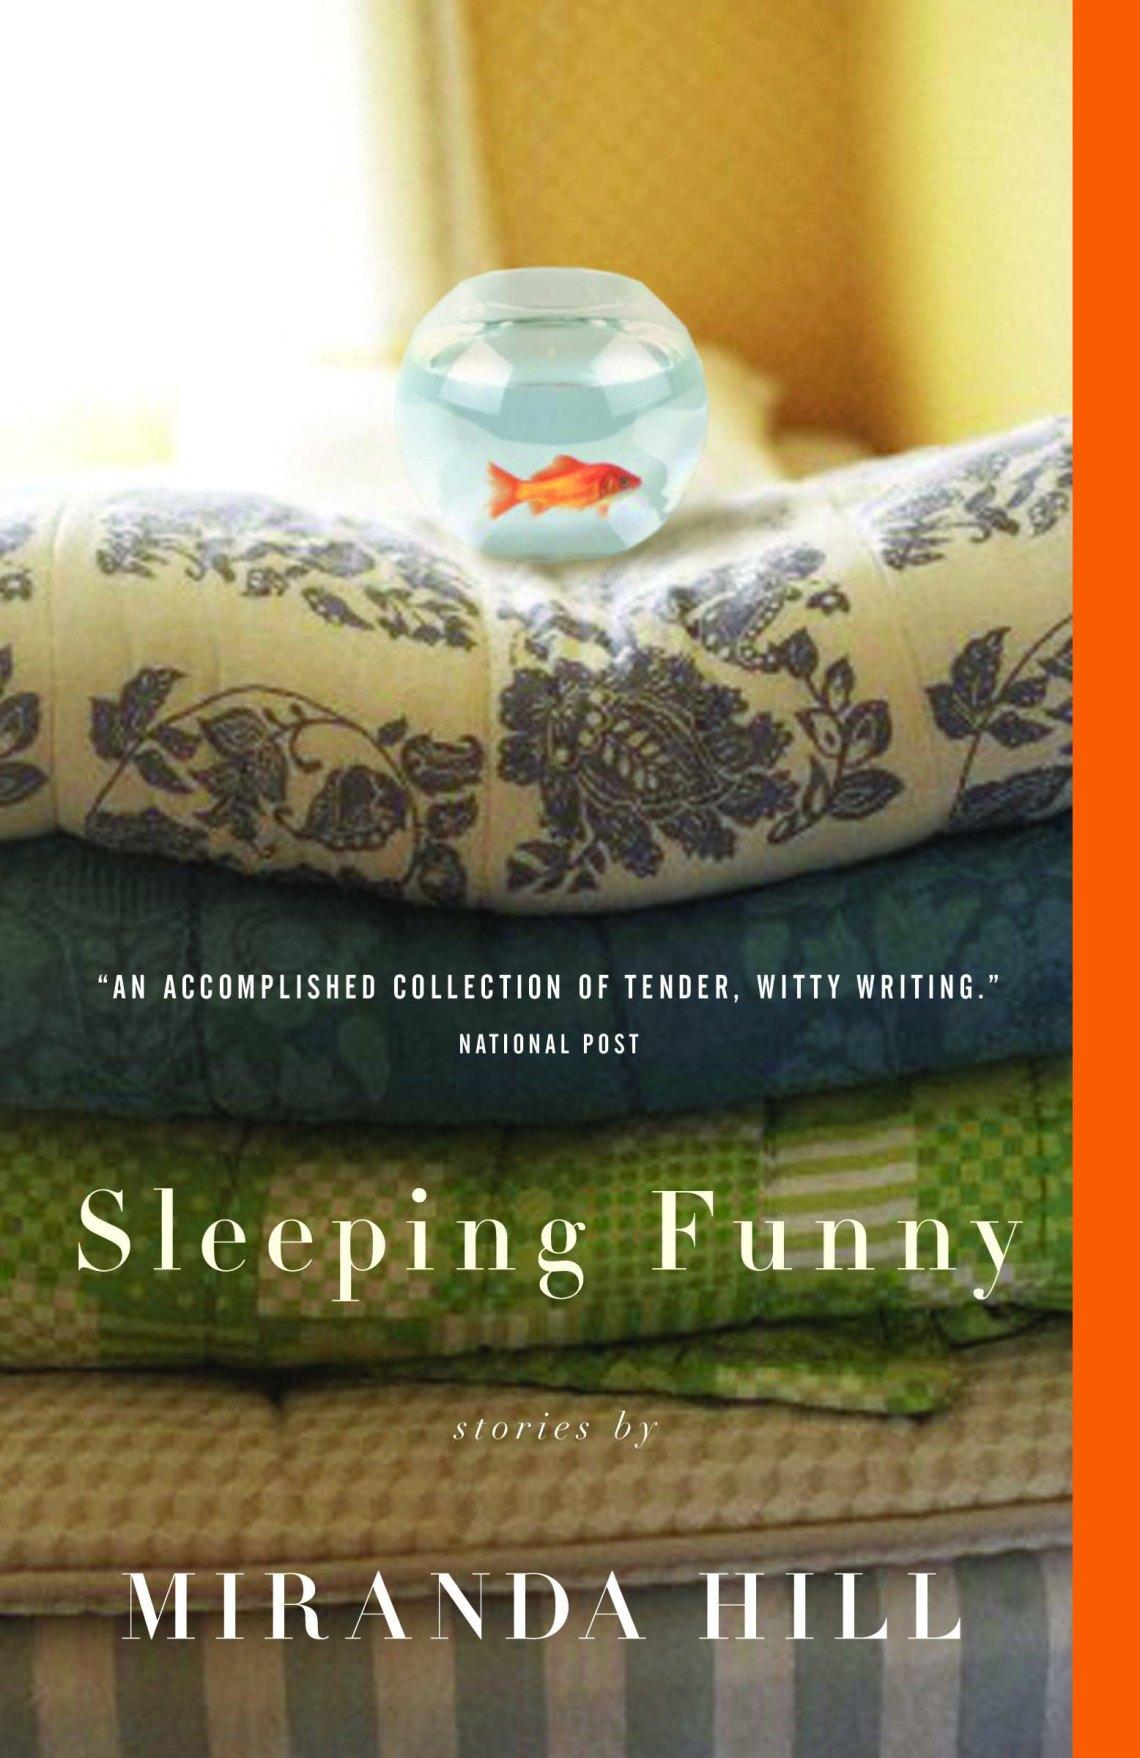 SleepingFunny soft cover